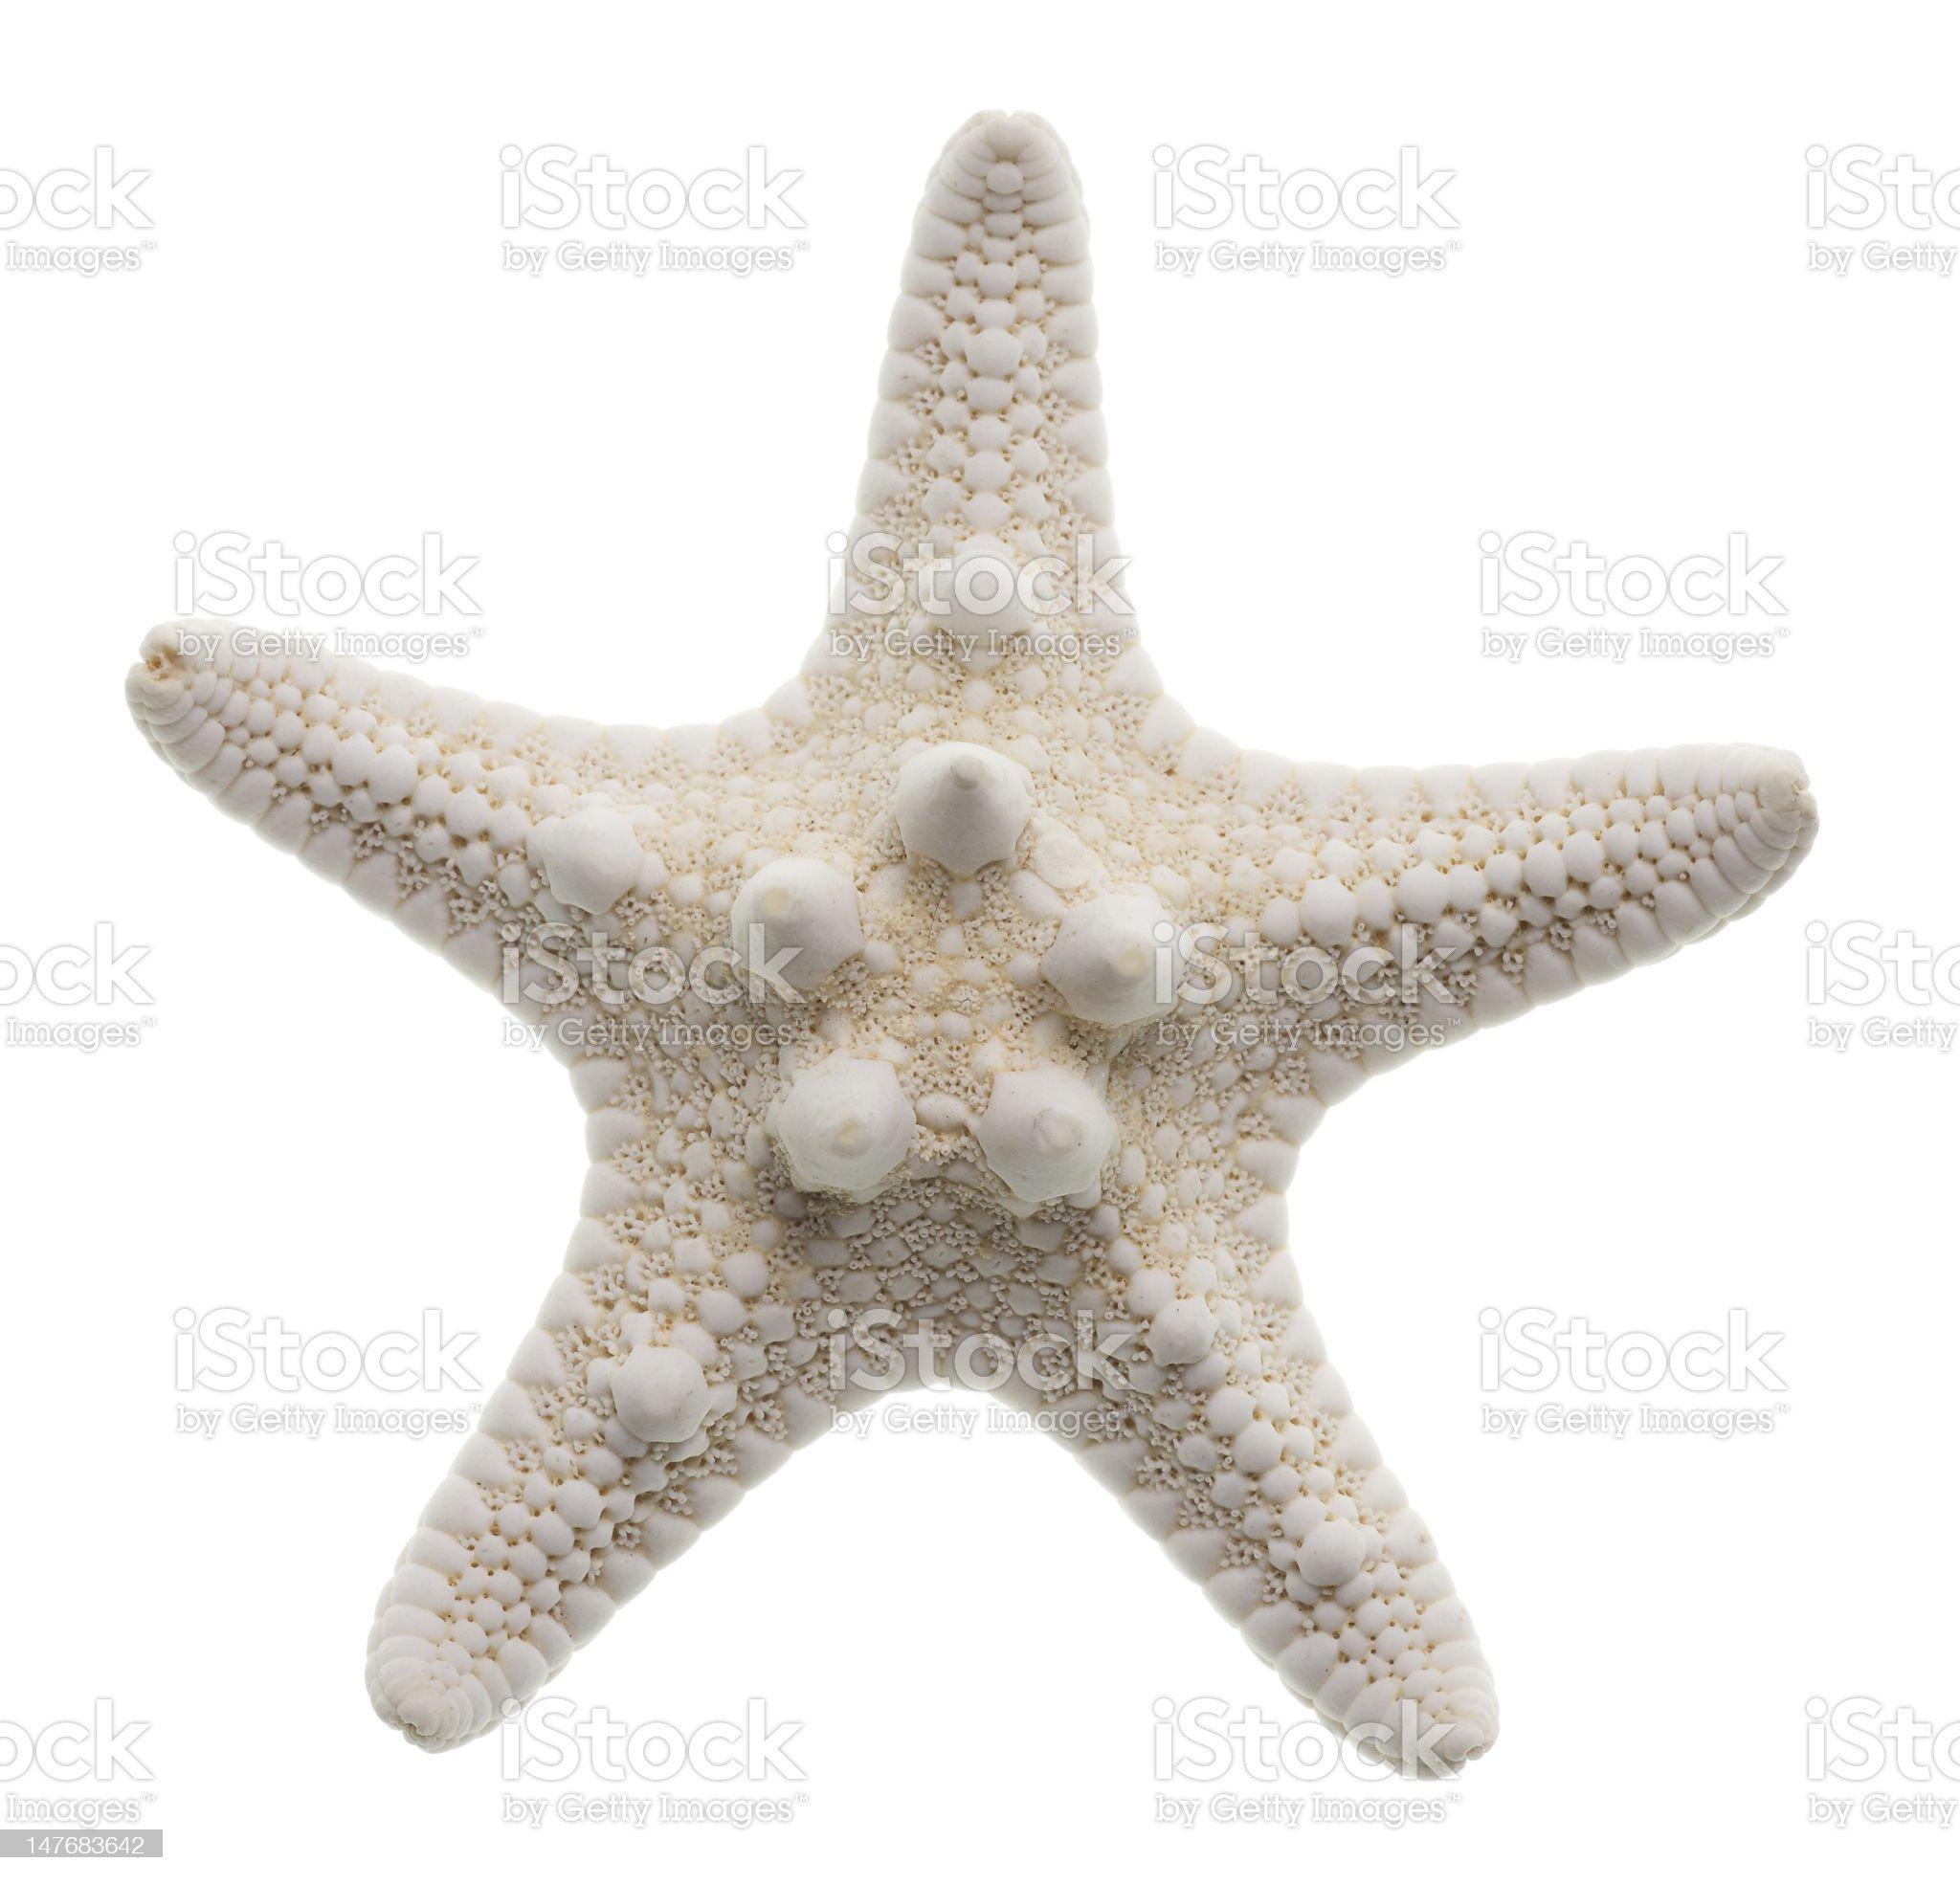 Starfish isolated on white royalty-free stock photo